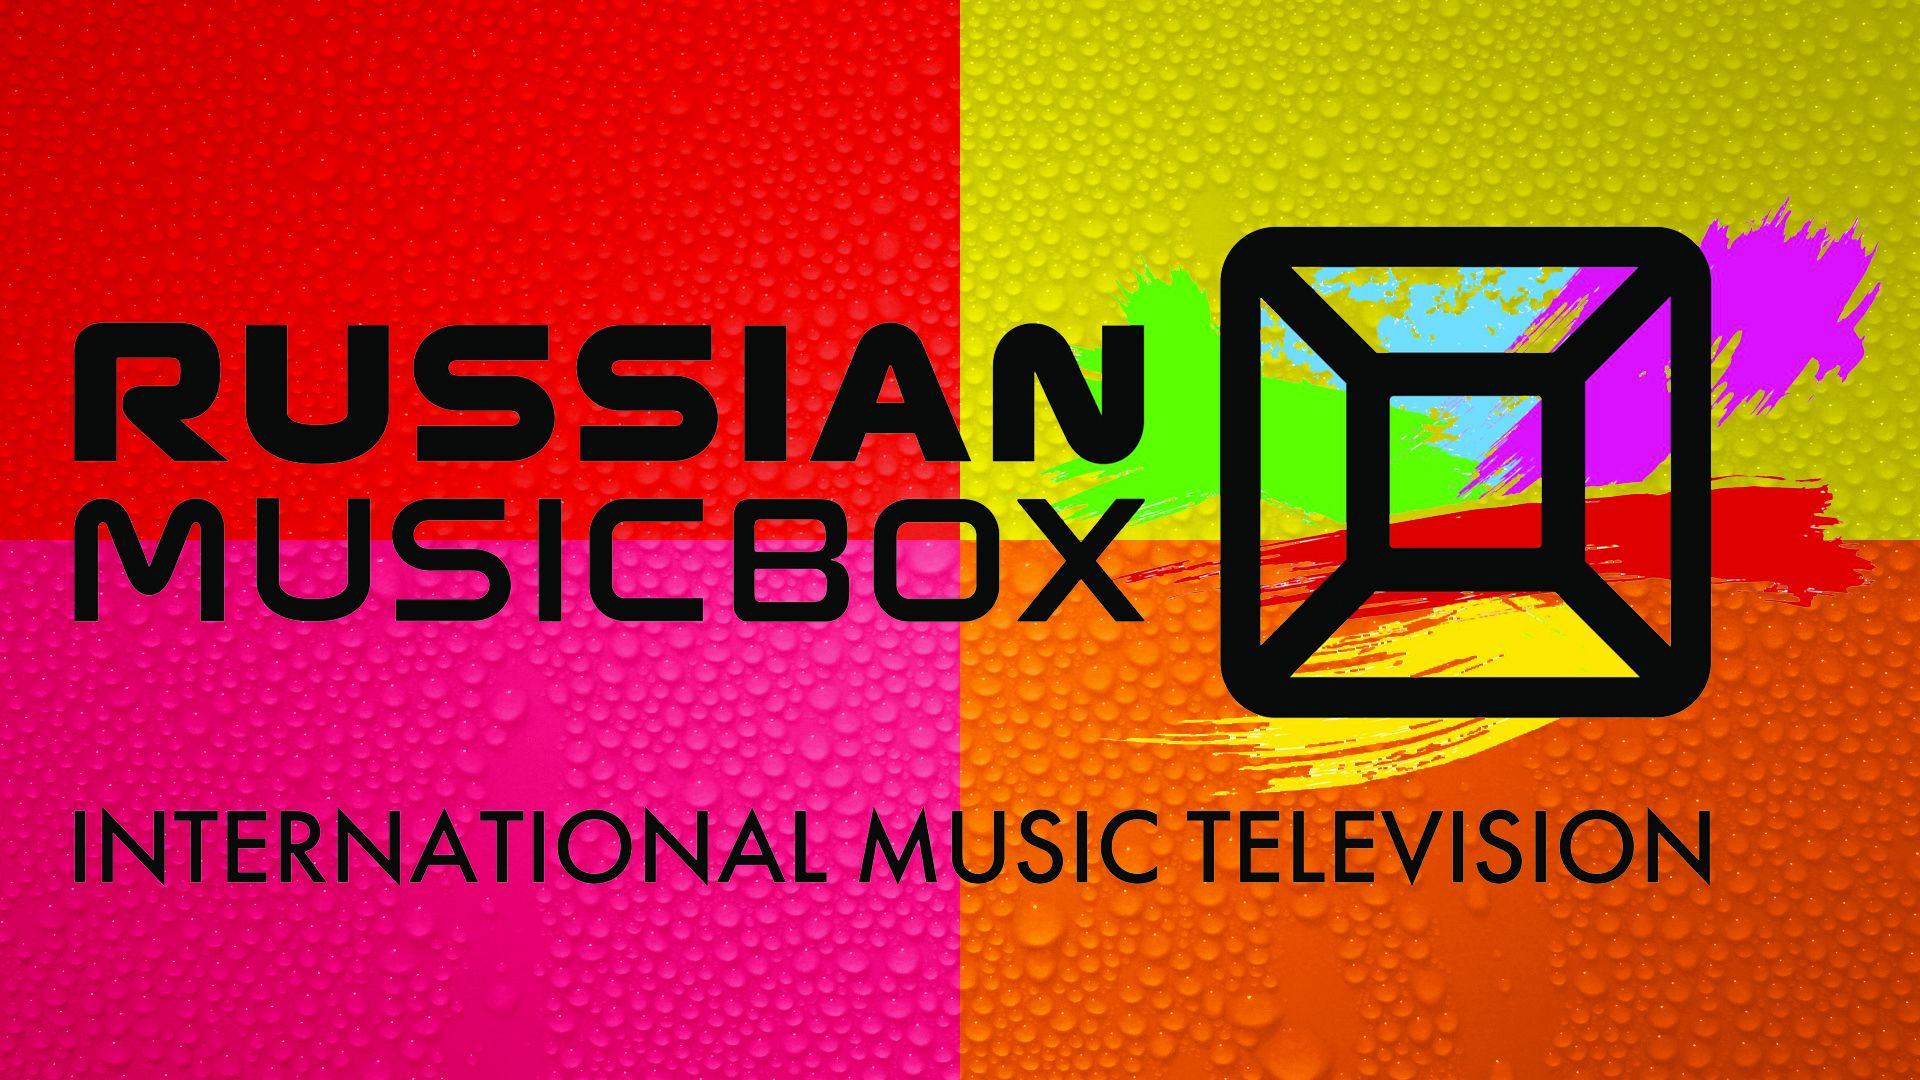 RUSSIAN MUSIC BOX